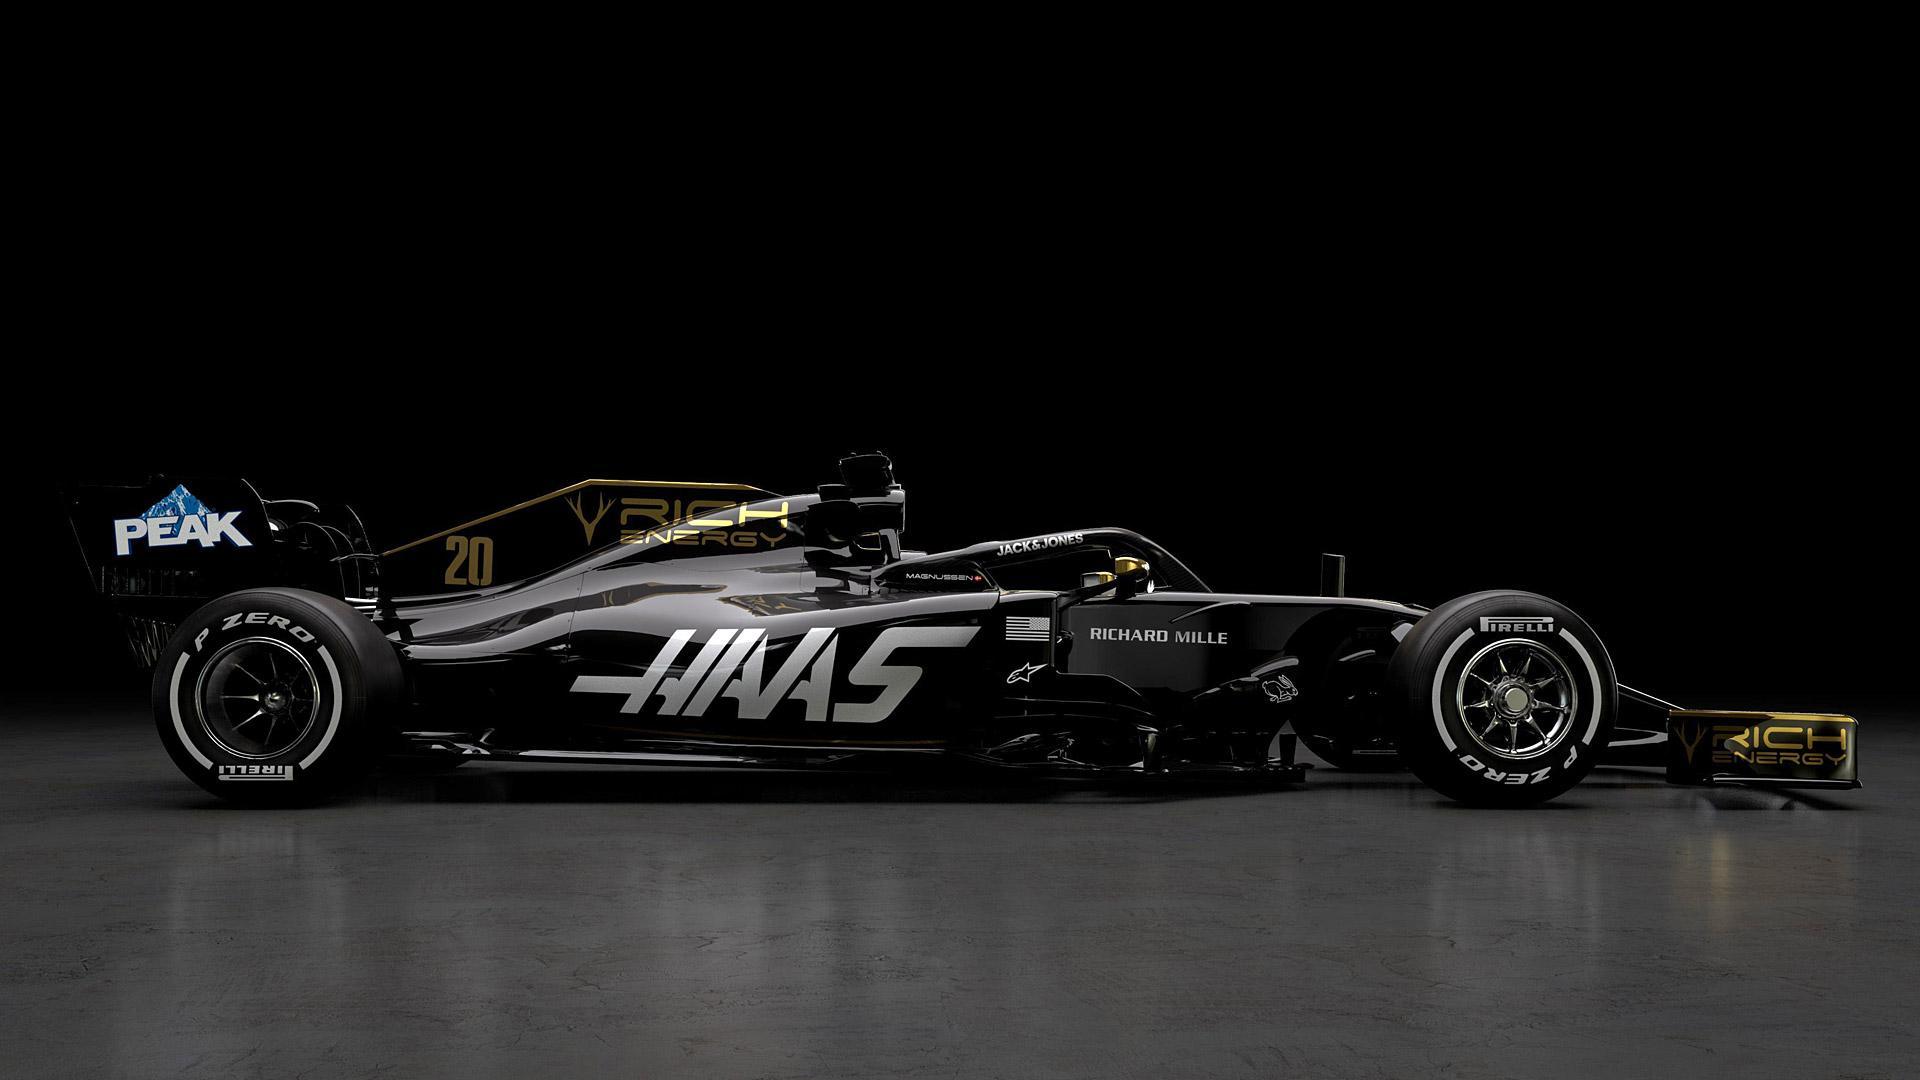 Haas F1 Teams Background 2